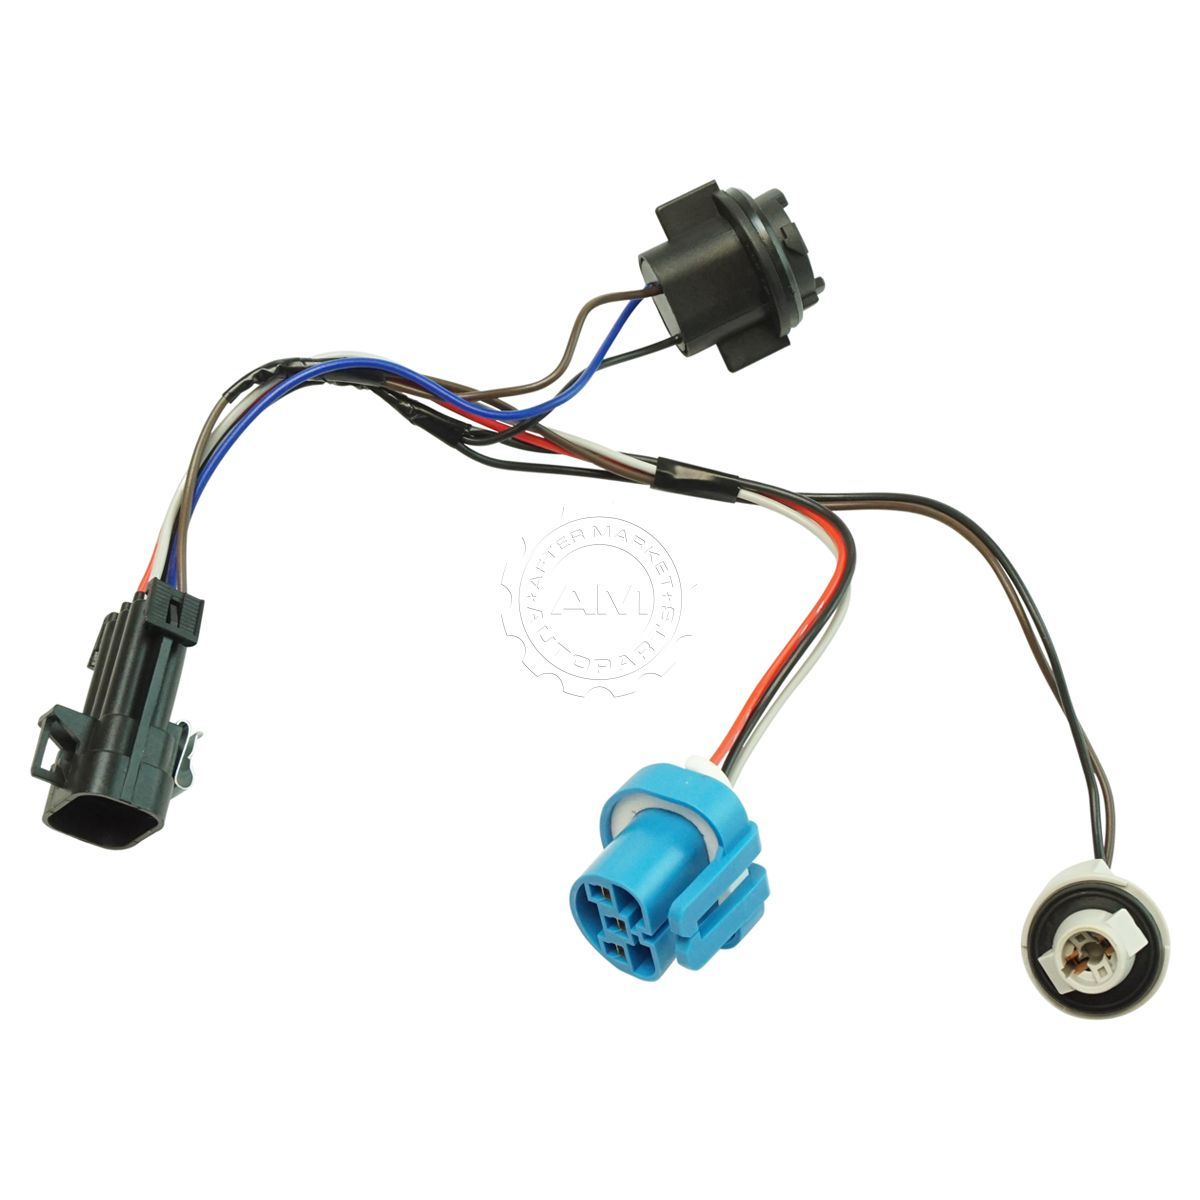 XM_8773] Headlight Wiring Harness Replacement Schematic WiringCana Kapemie Mohammedshrine Librar Wiring 101